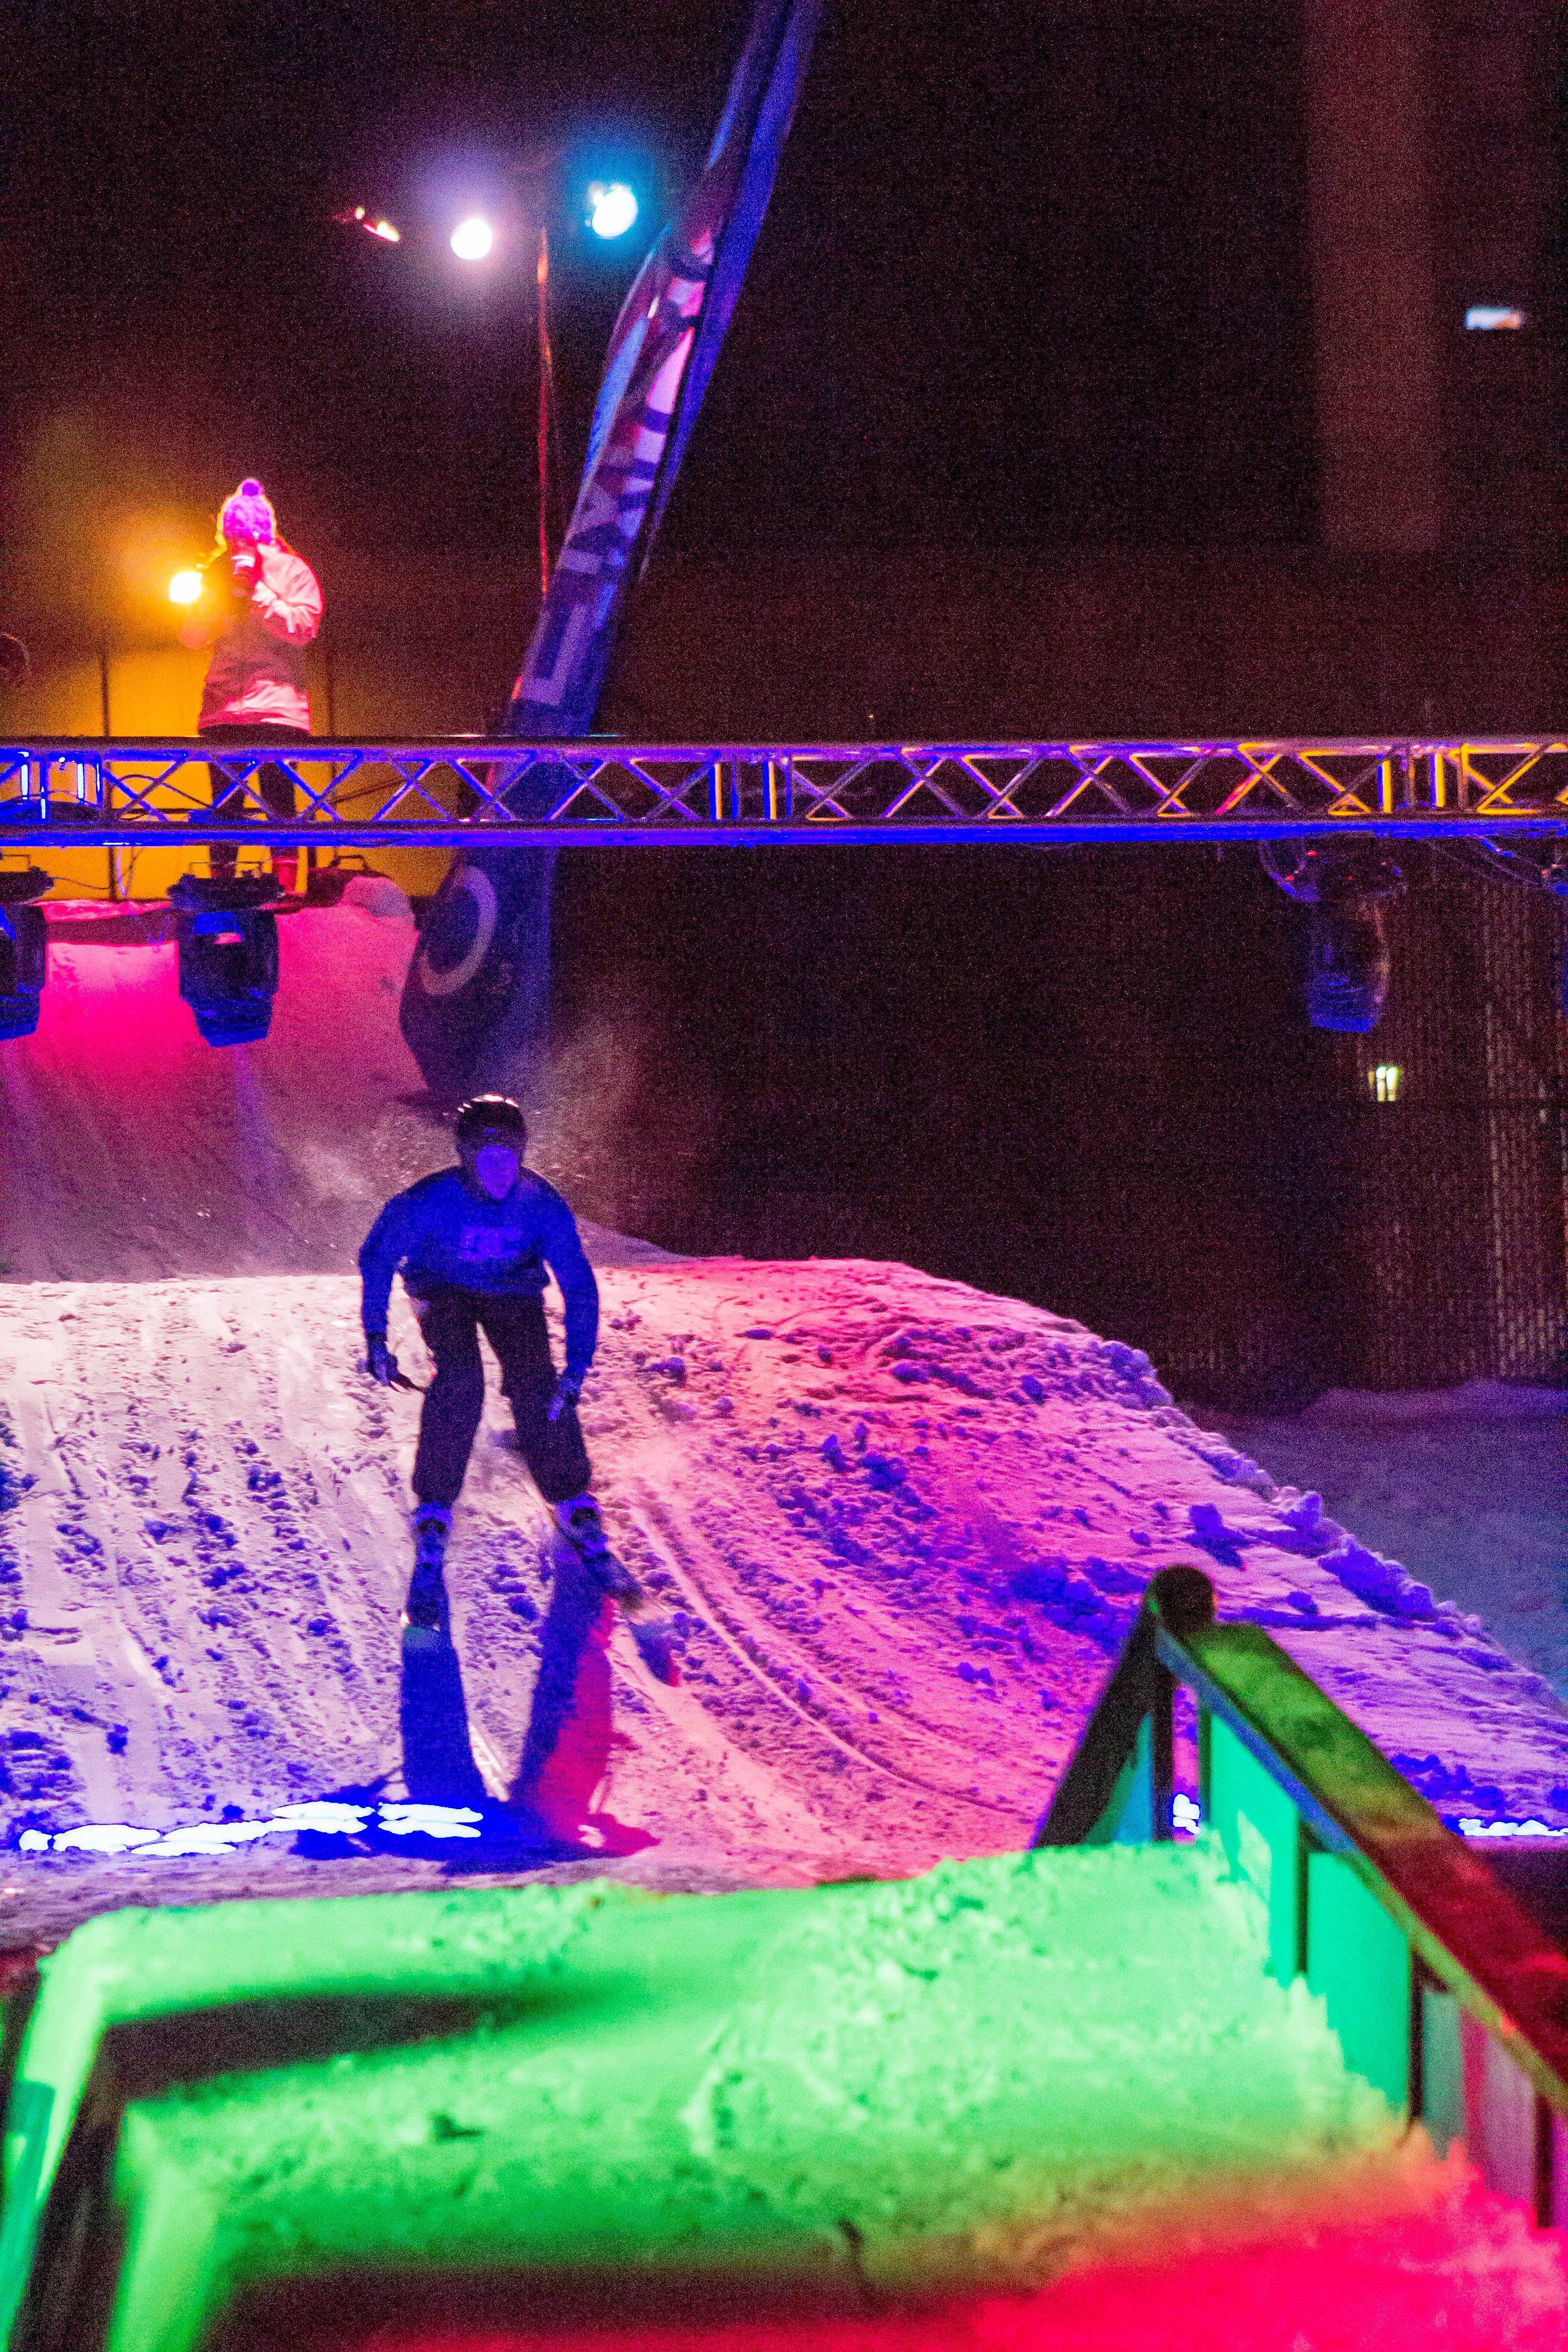 UMass Ski and Snowboard Club's annual Winter Festival and Rail Jam